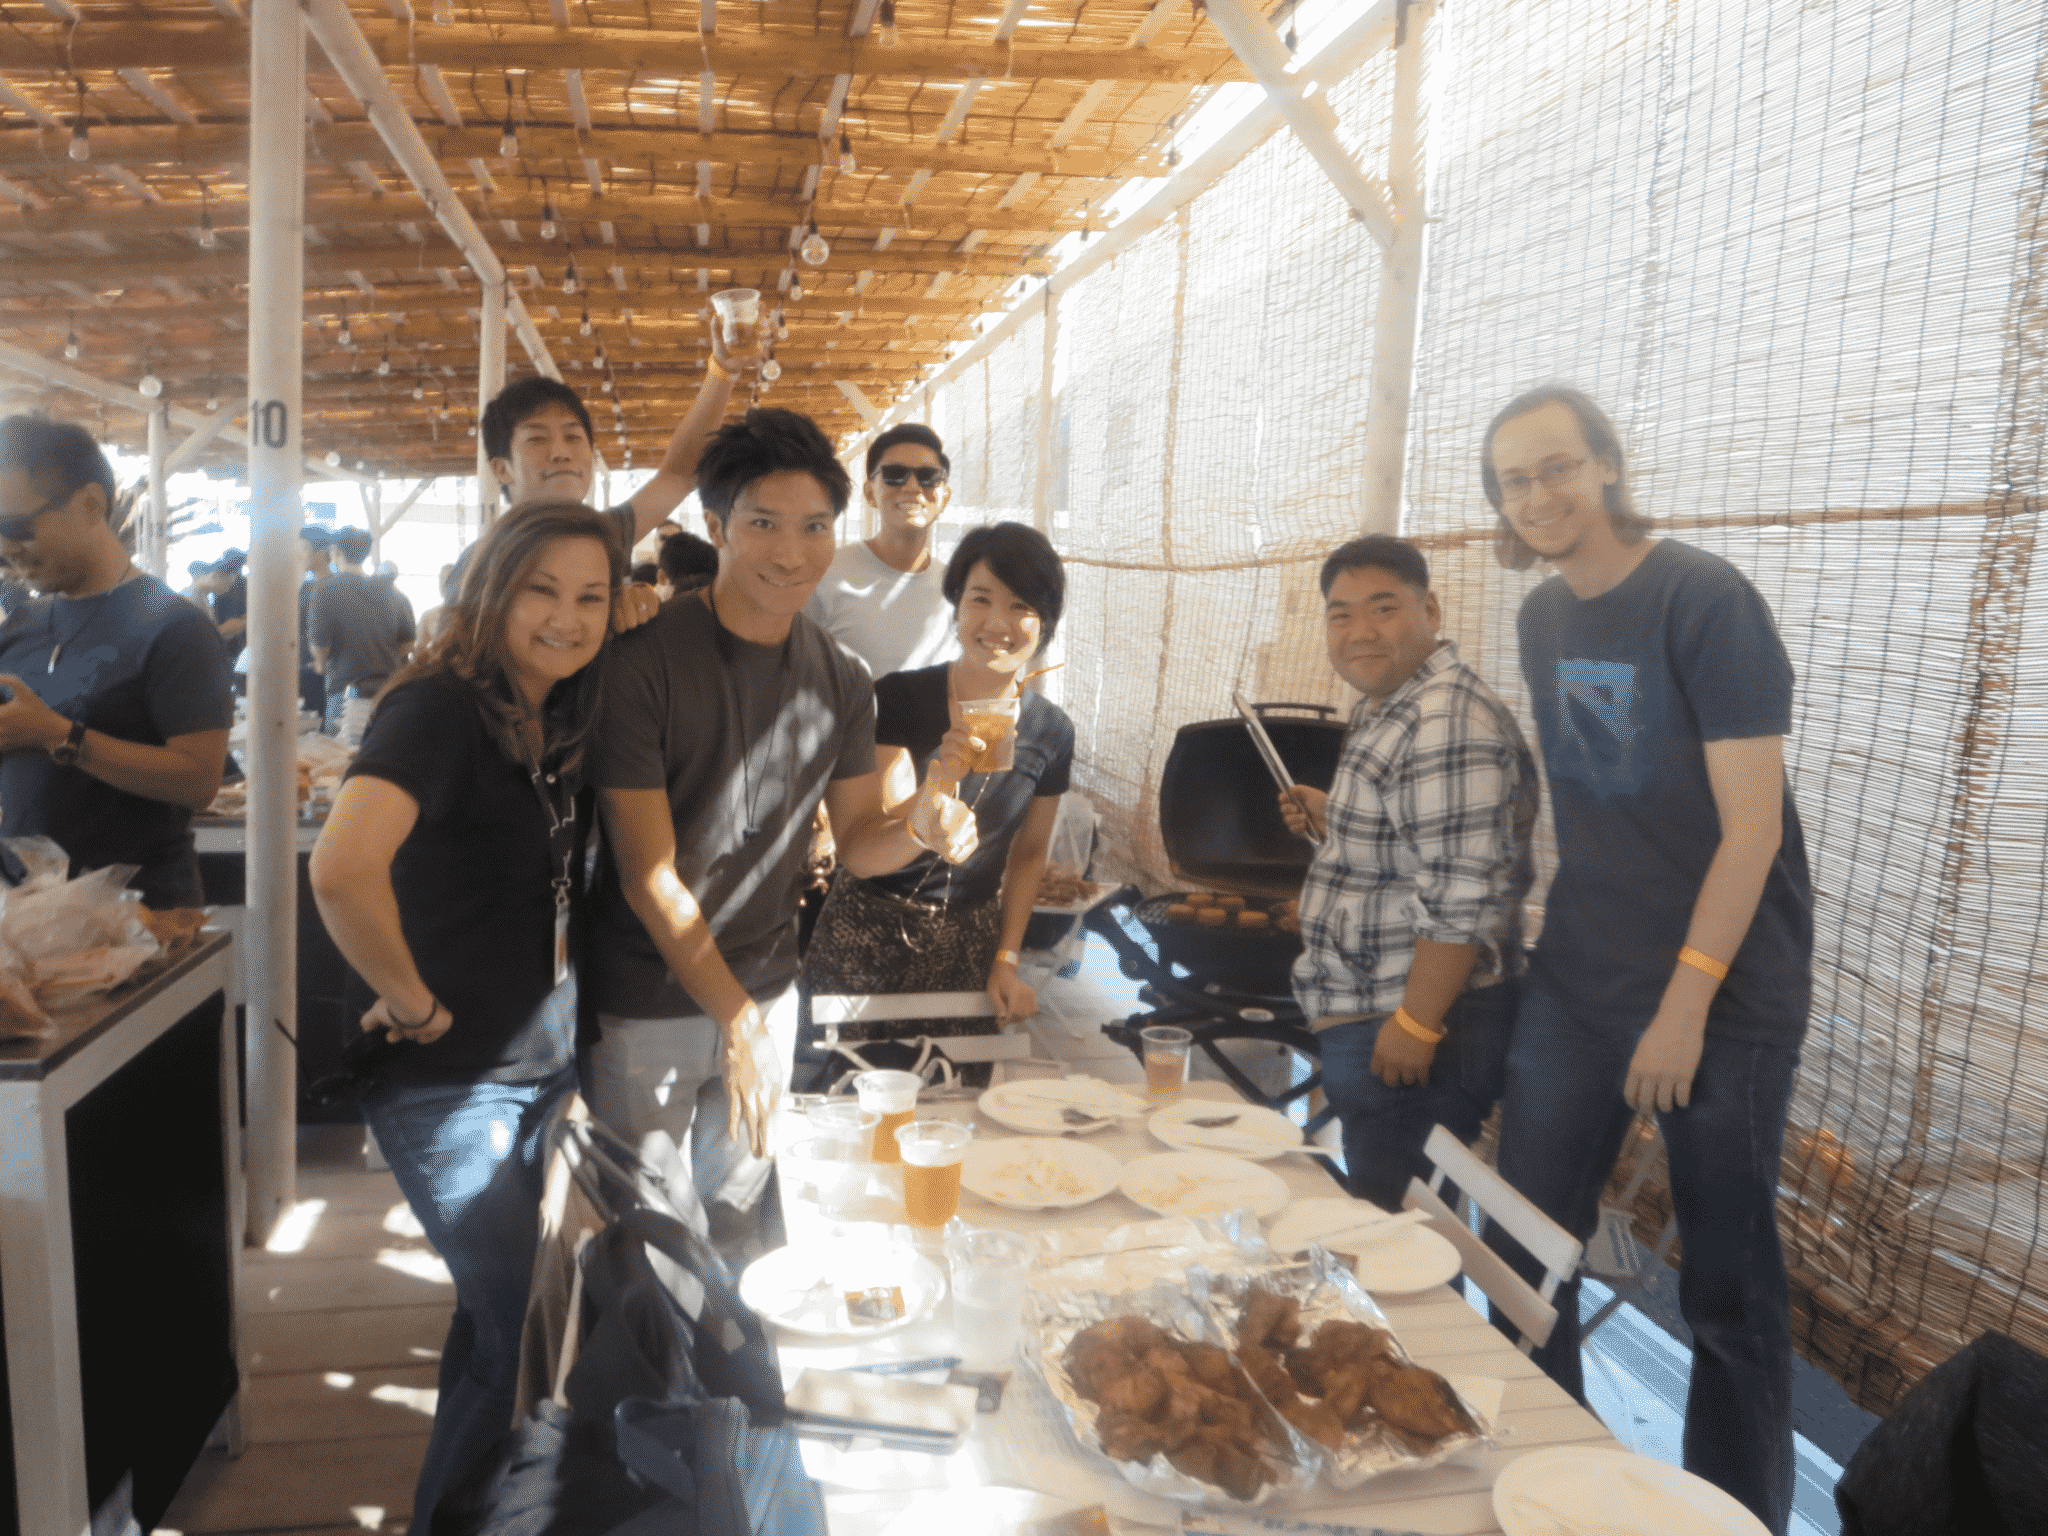 Criteo東京オフィスでは、去る9月28日(金)、「Criteo Offsite BBQ」を開催しました!